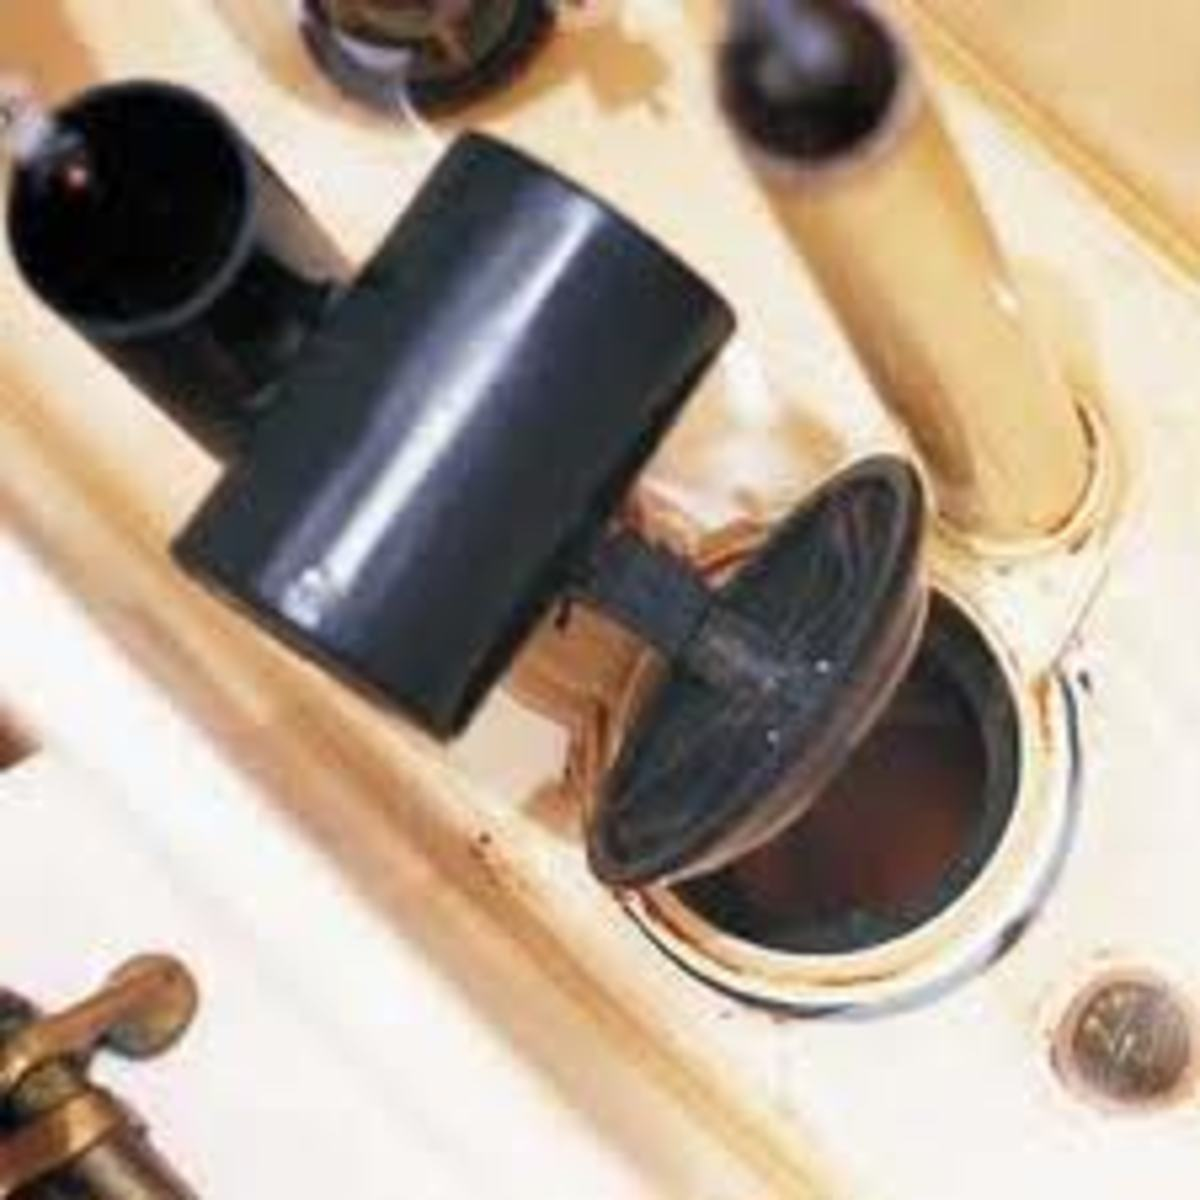 Worn out or damaged valve